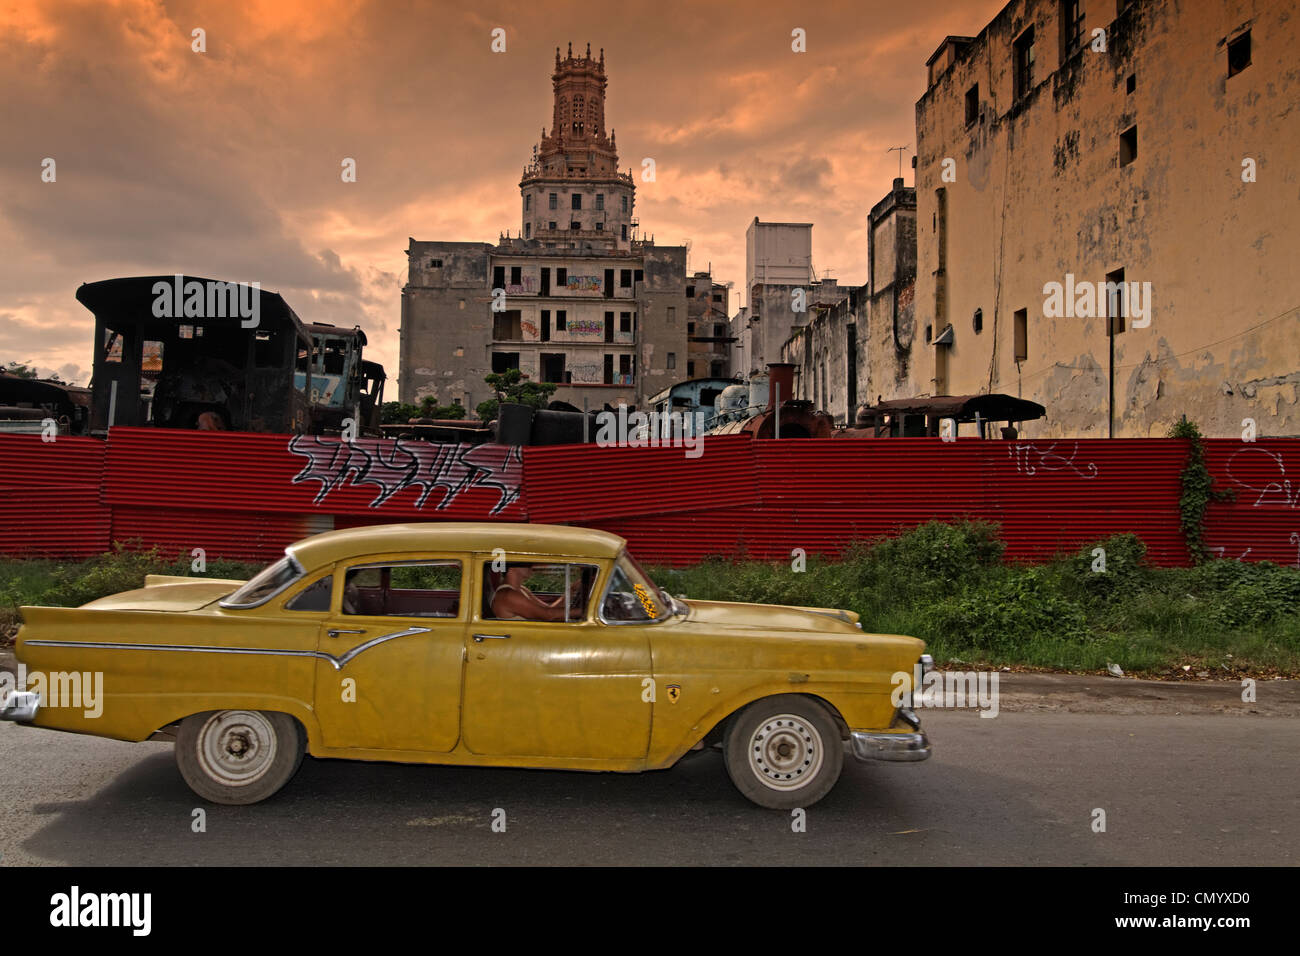 Oldtimer in Havanna, Kuba, große Antillen, Antillen, Karibik, Westindien, Mittelamerika, Nordamerika, Amerika Stockbild